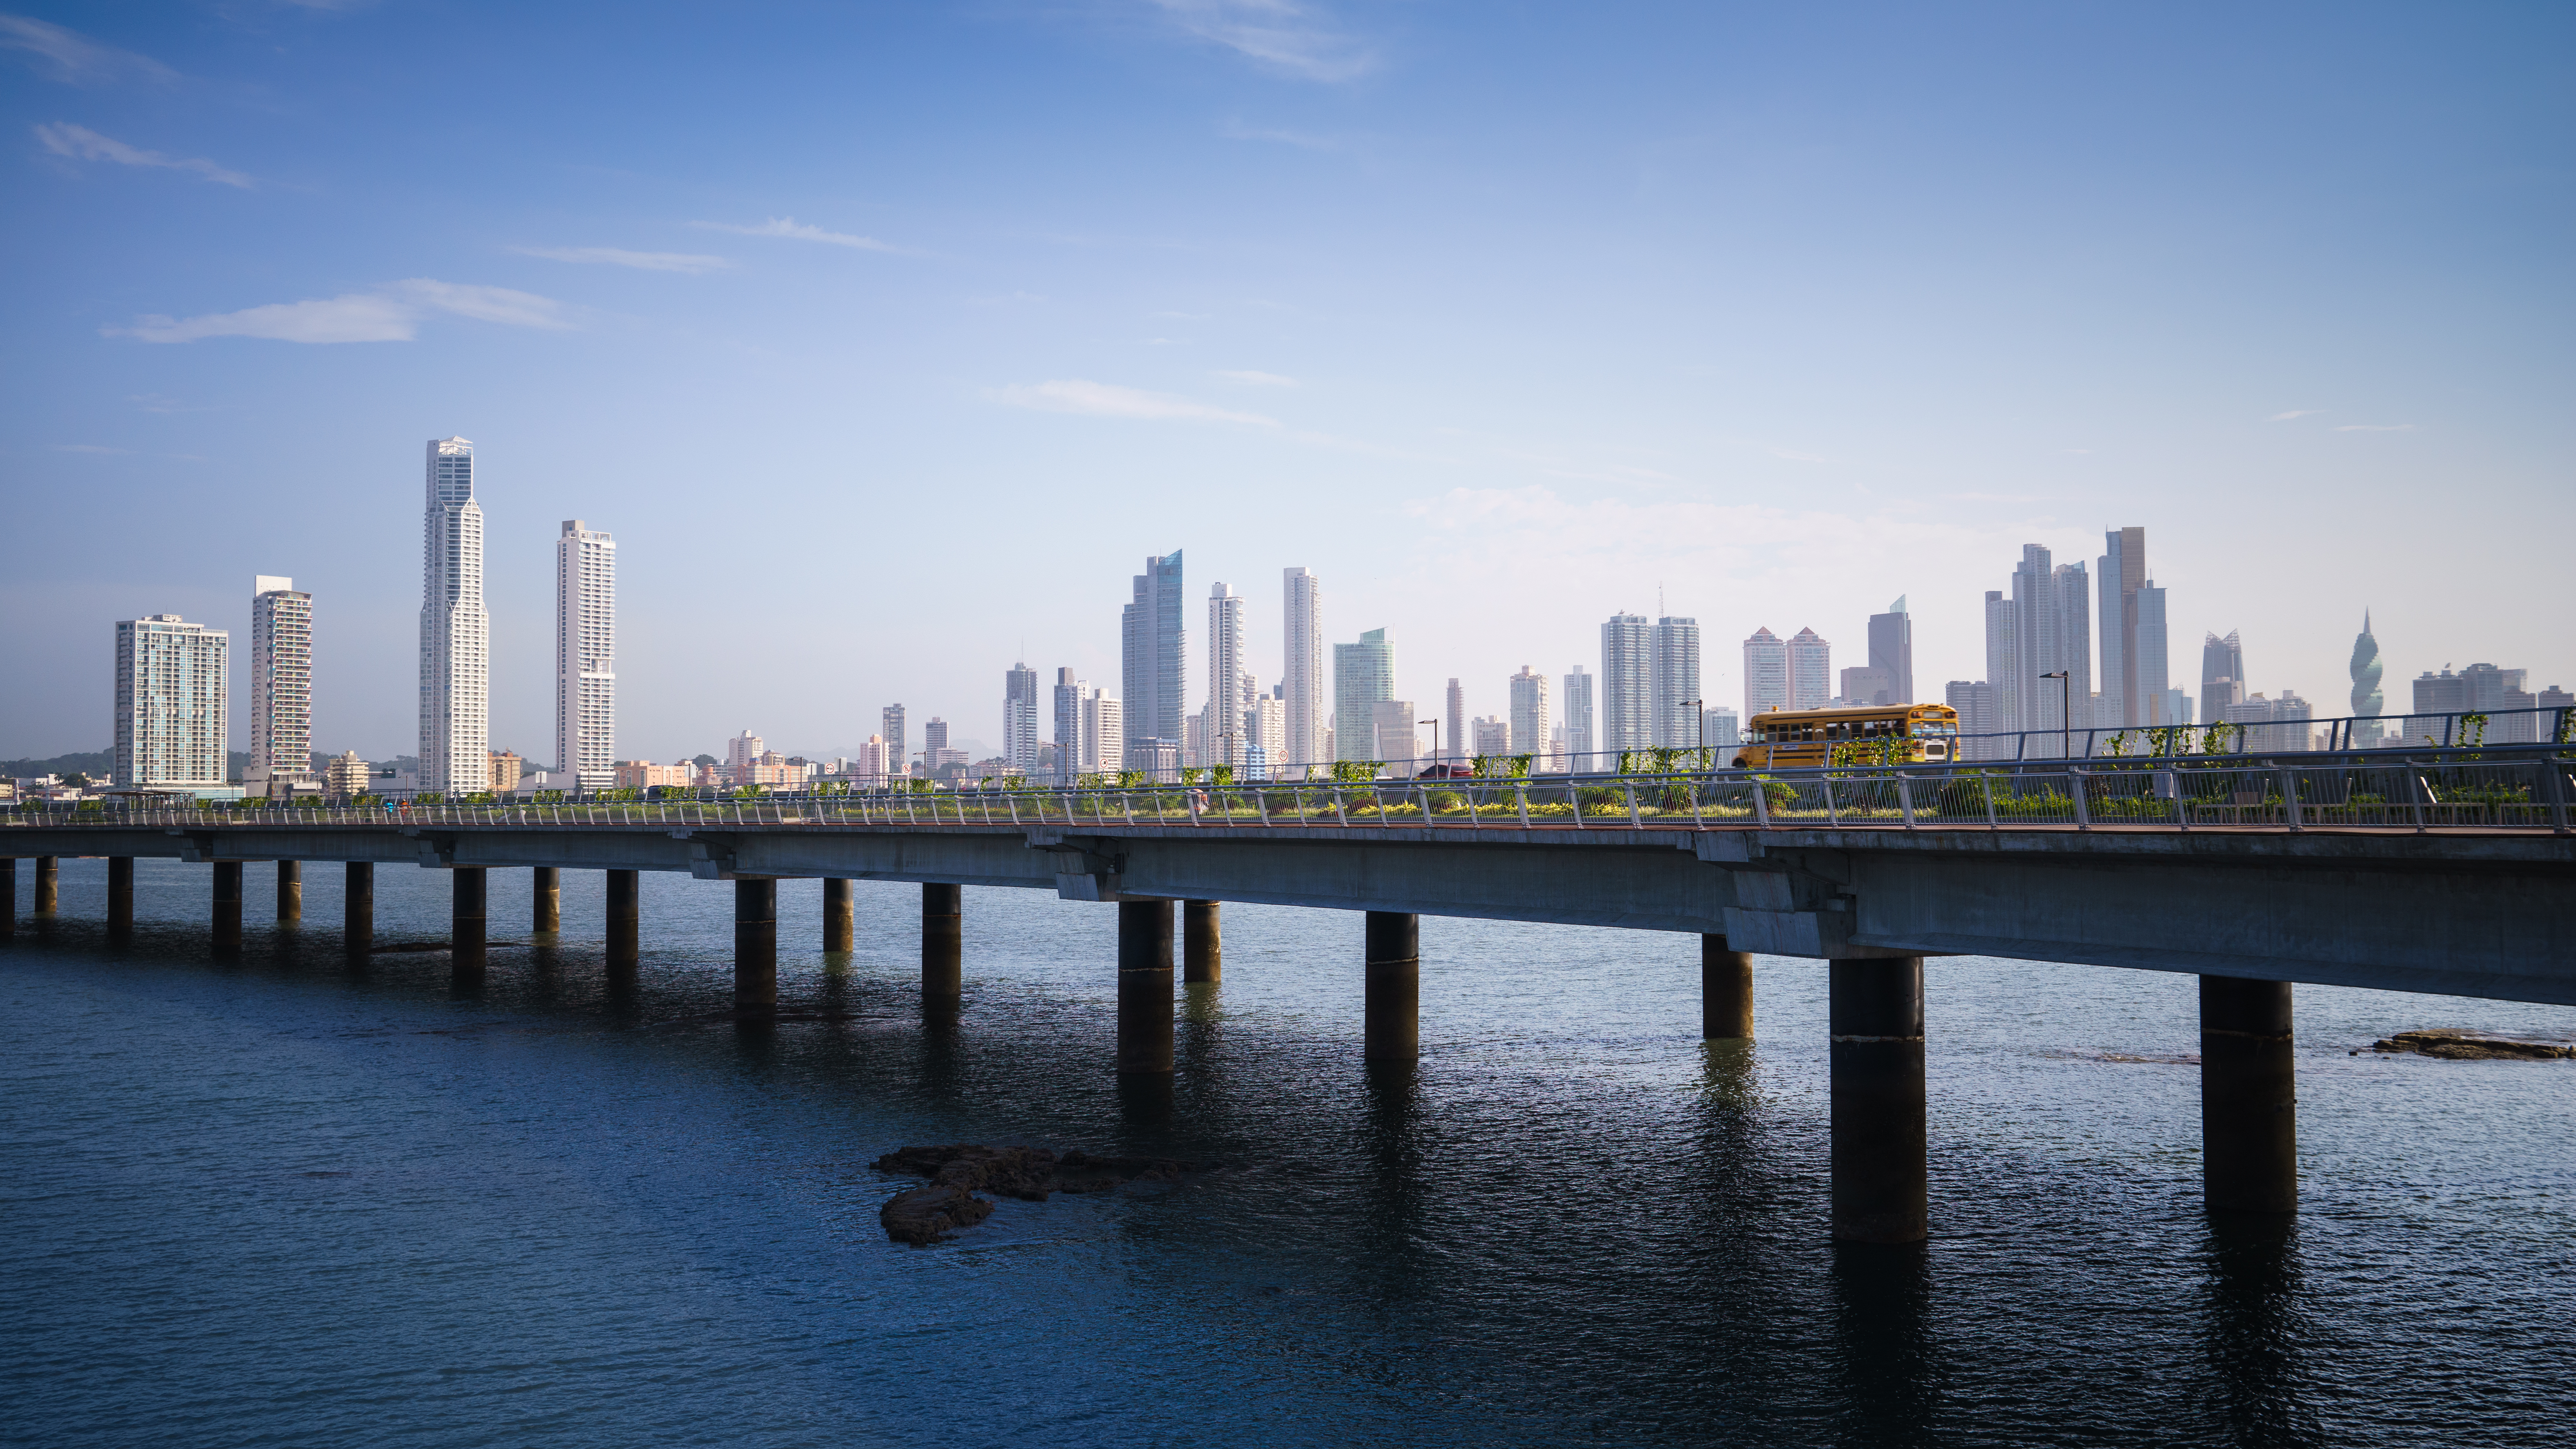 Panoramic view of Panama City skyline and highway - panama vs belize